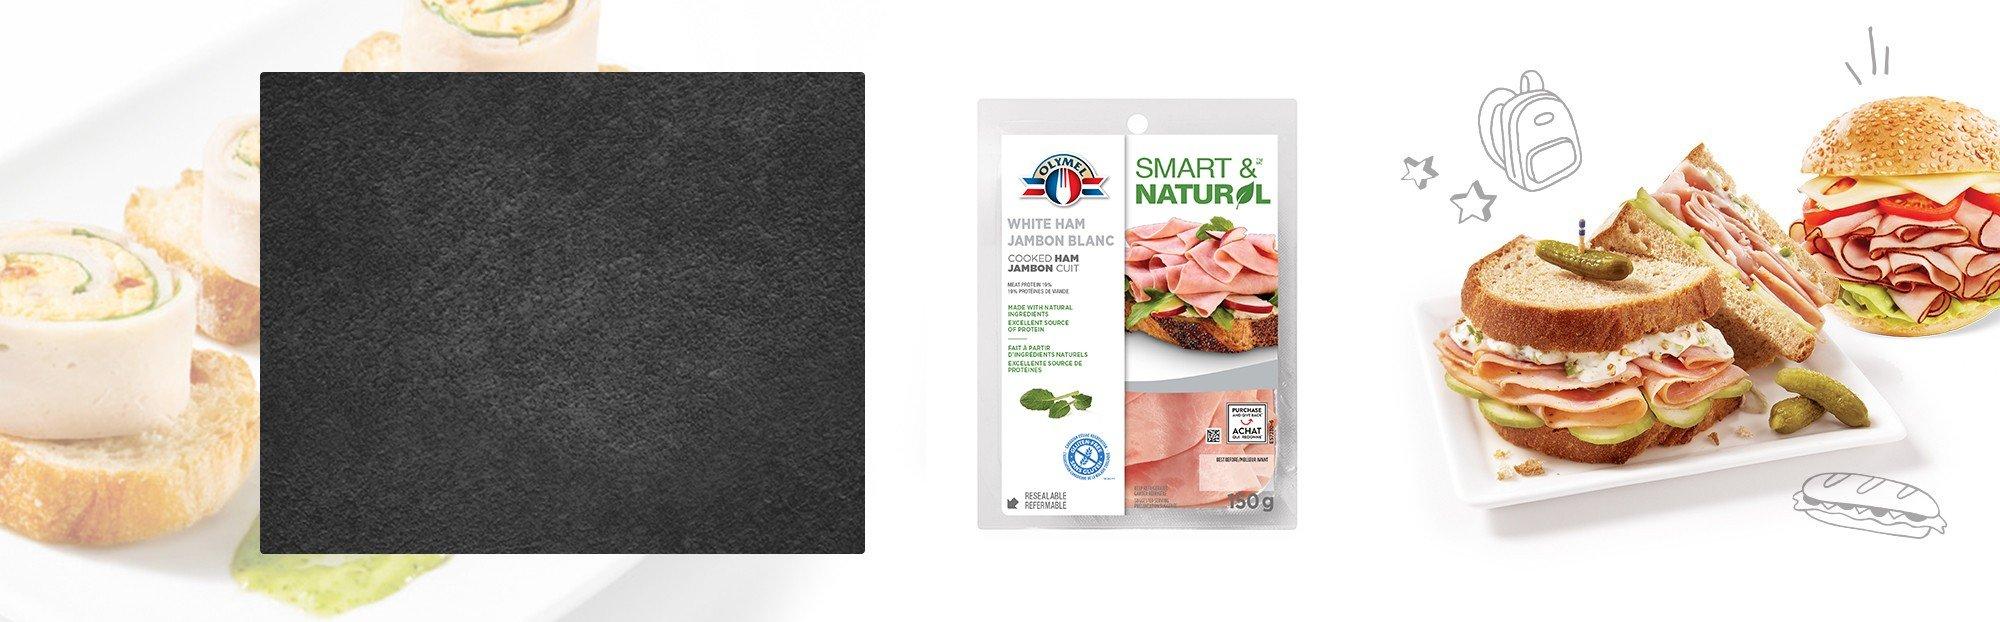 Shaved Cooked White Ham Olymel Smart & Natural